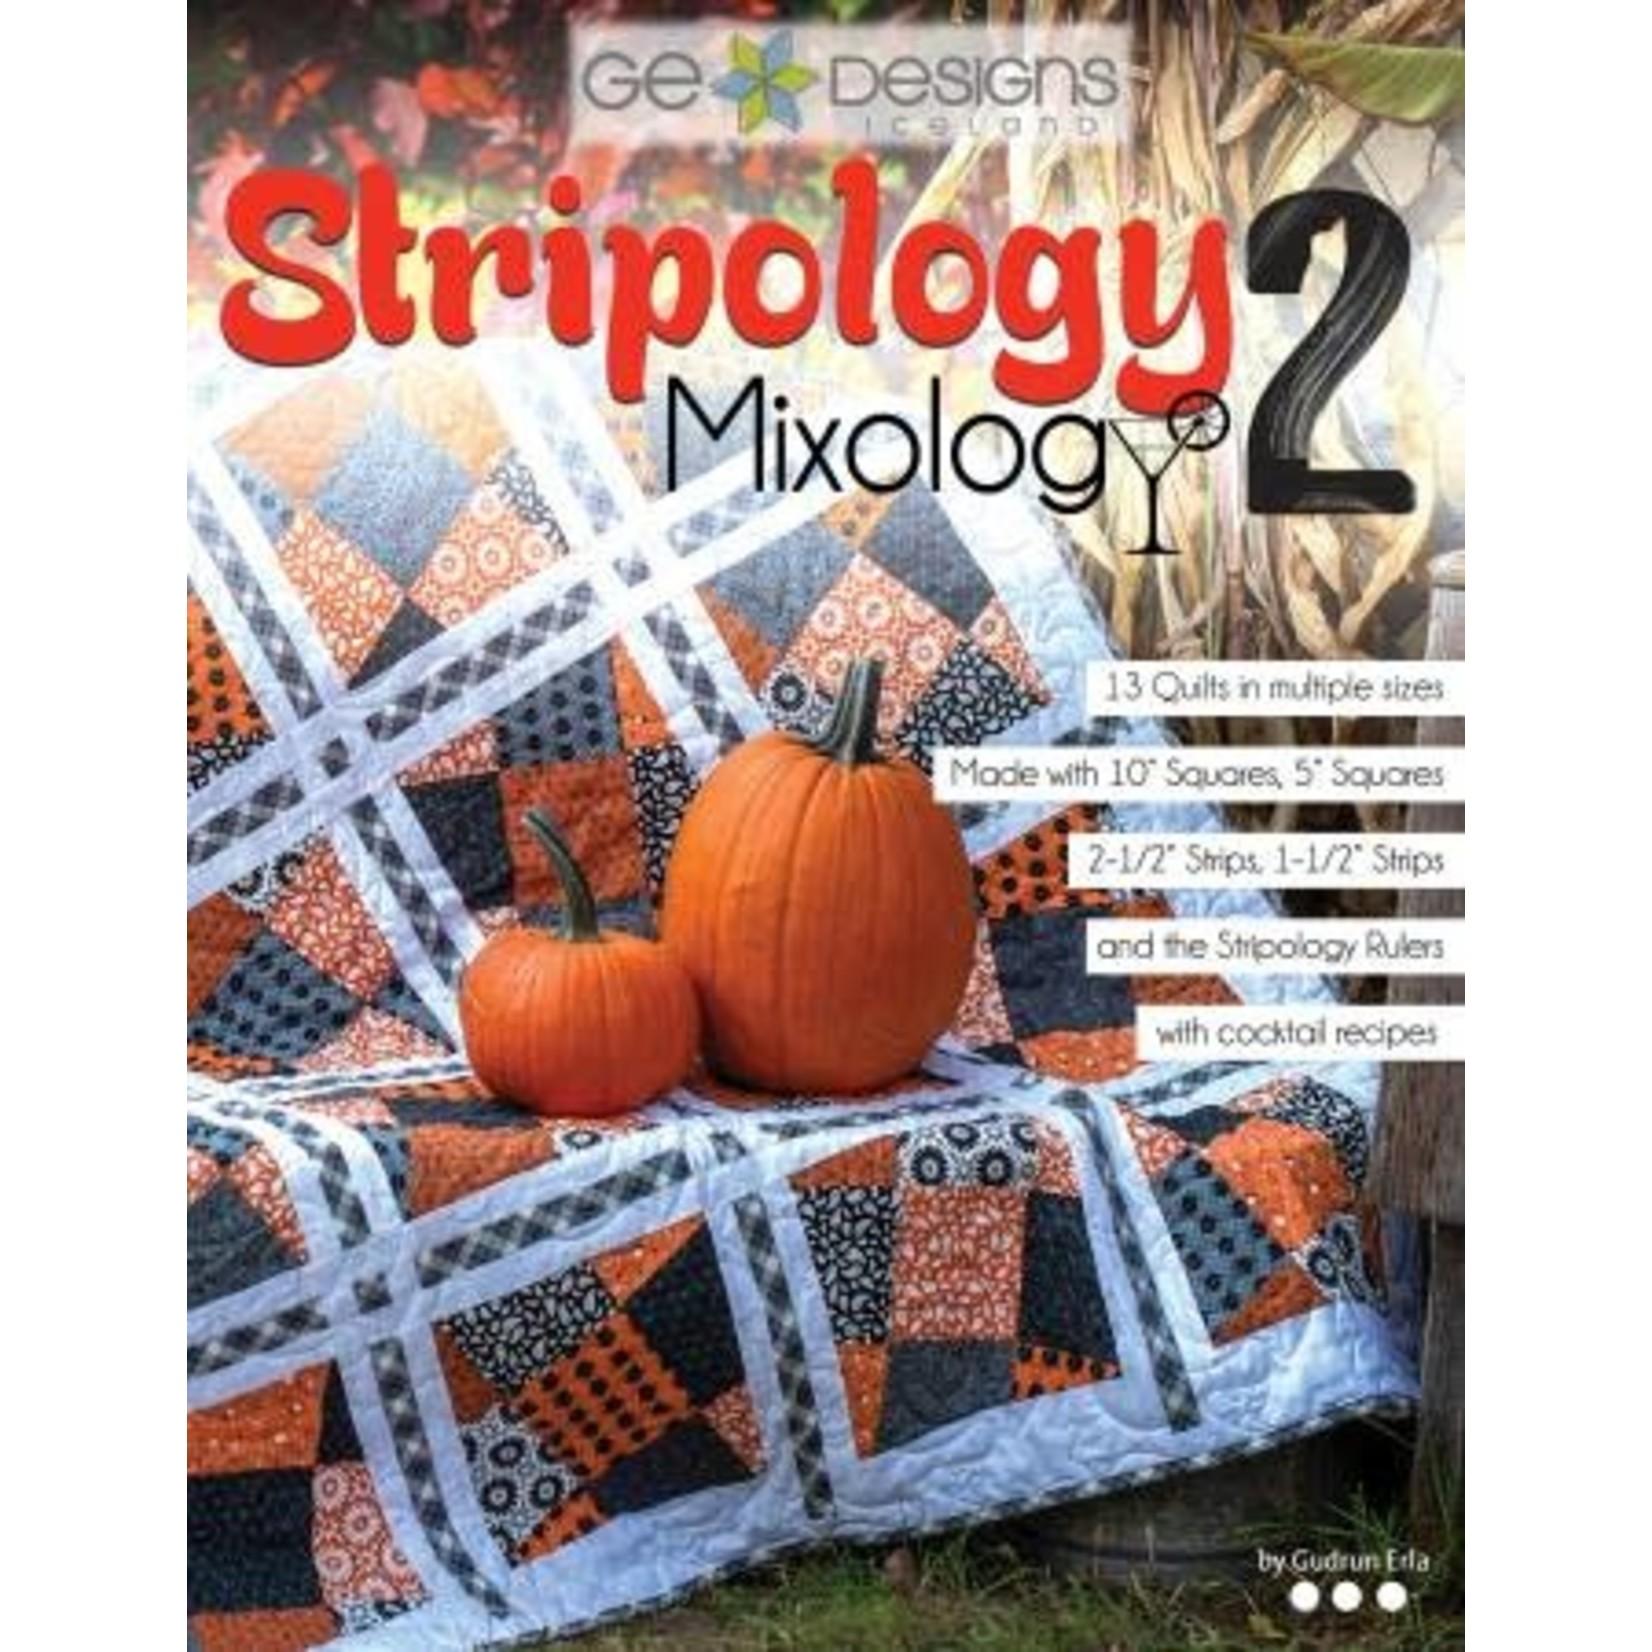 GE Designs Stripology Mixology 2